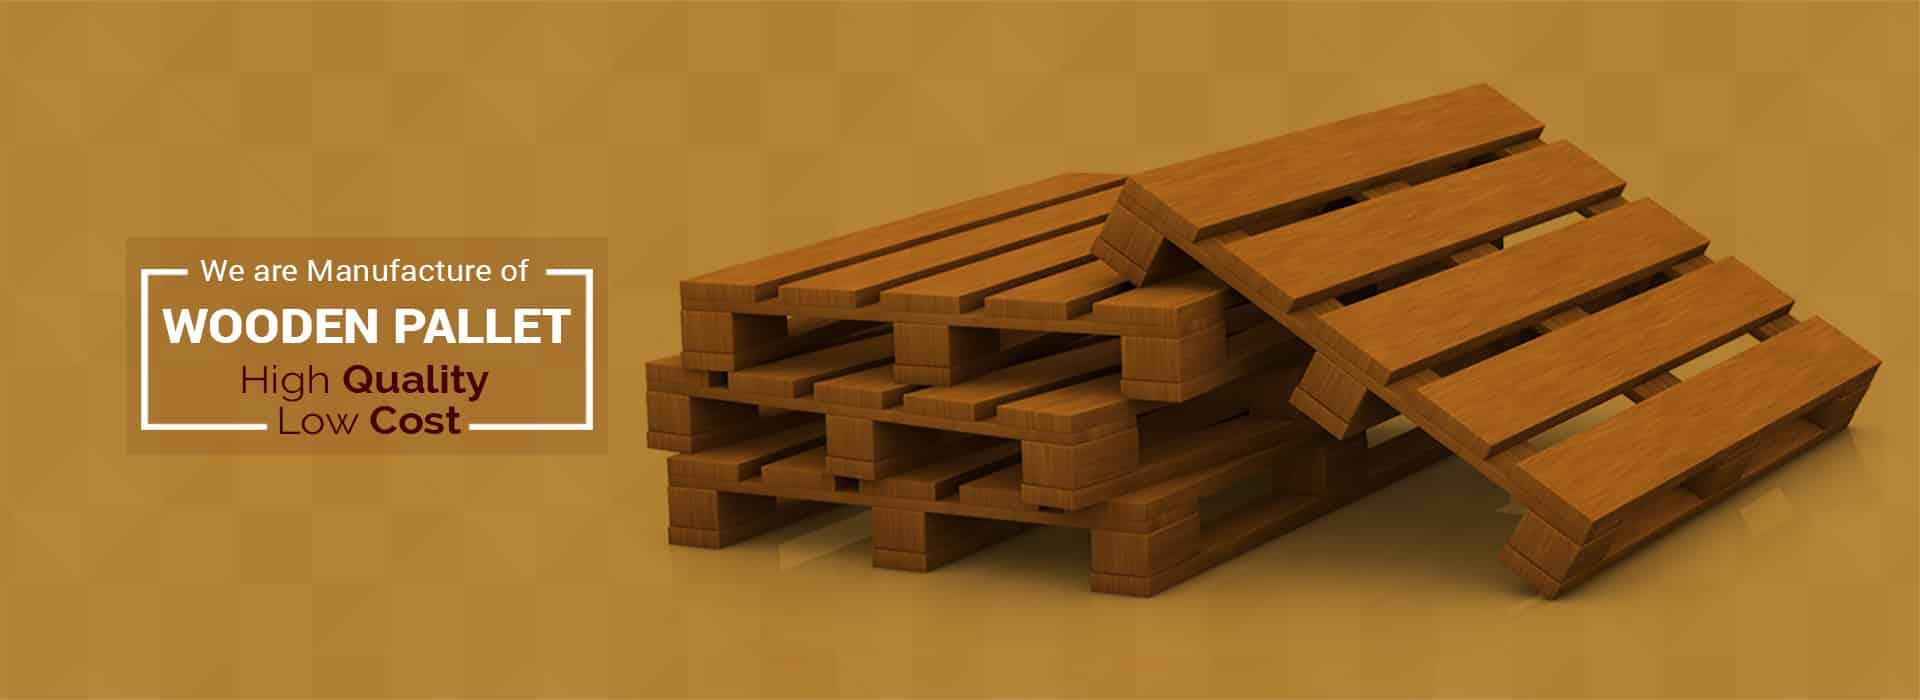 Wooden Box Supplier in India - Mumbai, Delhi